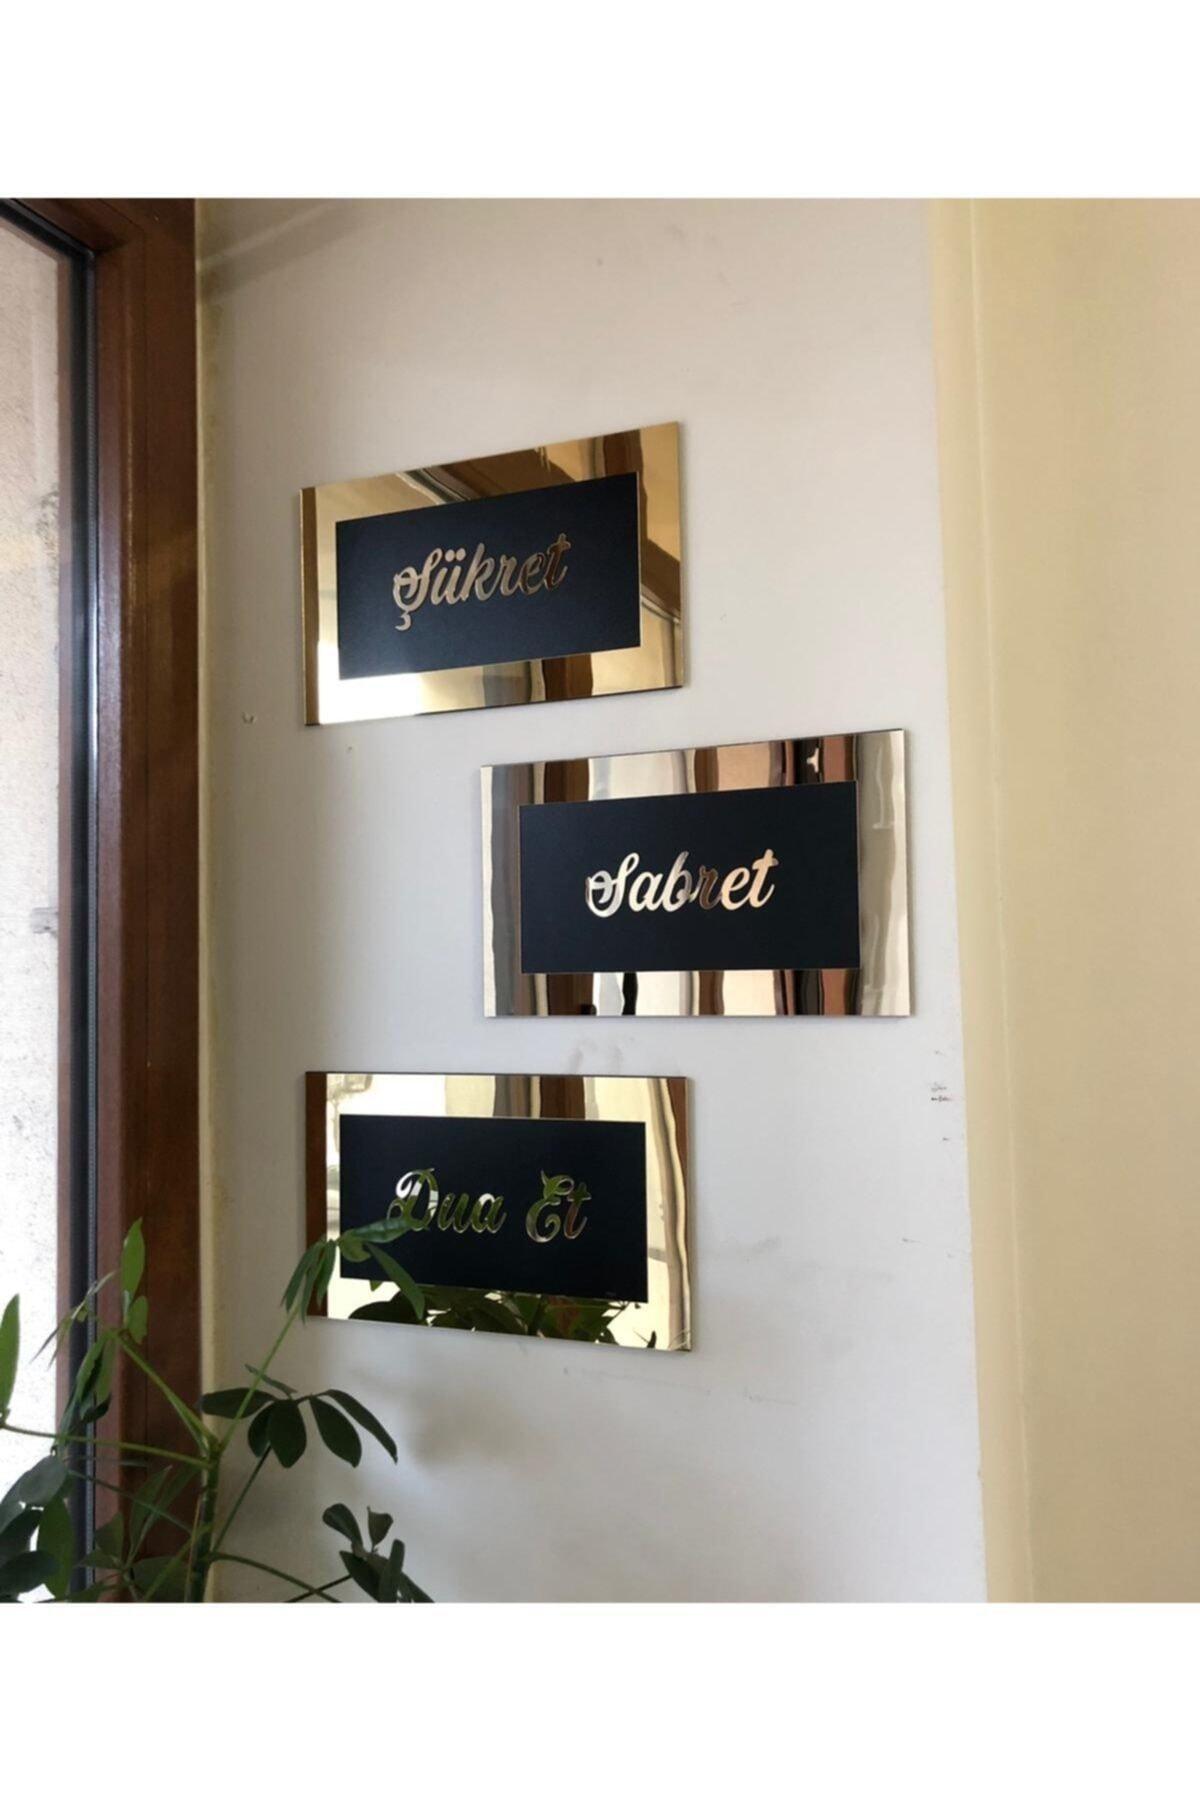 stilinbu Tablo Şükret Sabret Dua Et Pleksi Aynalı Gold 1